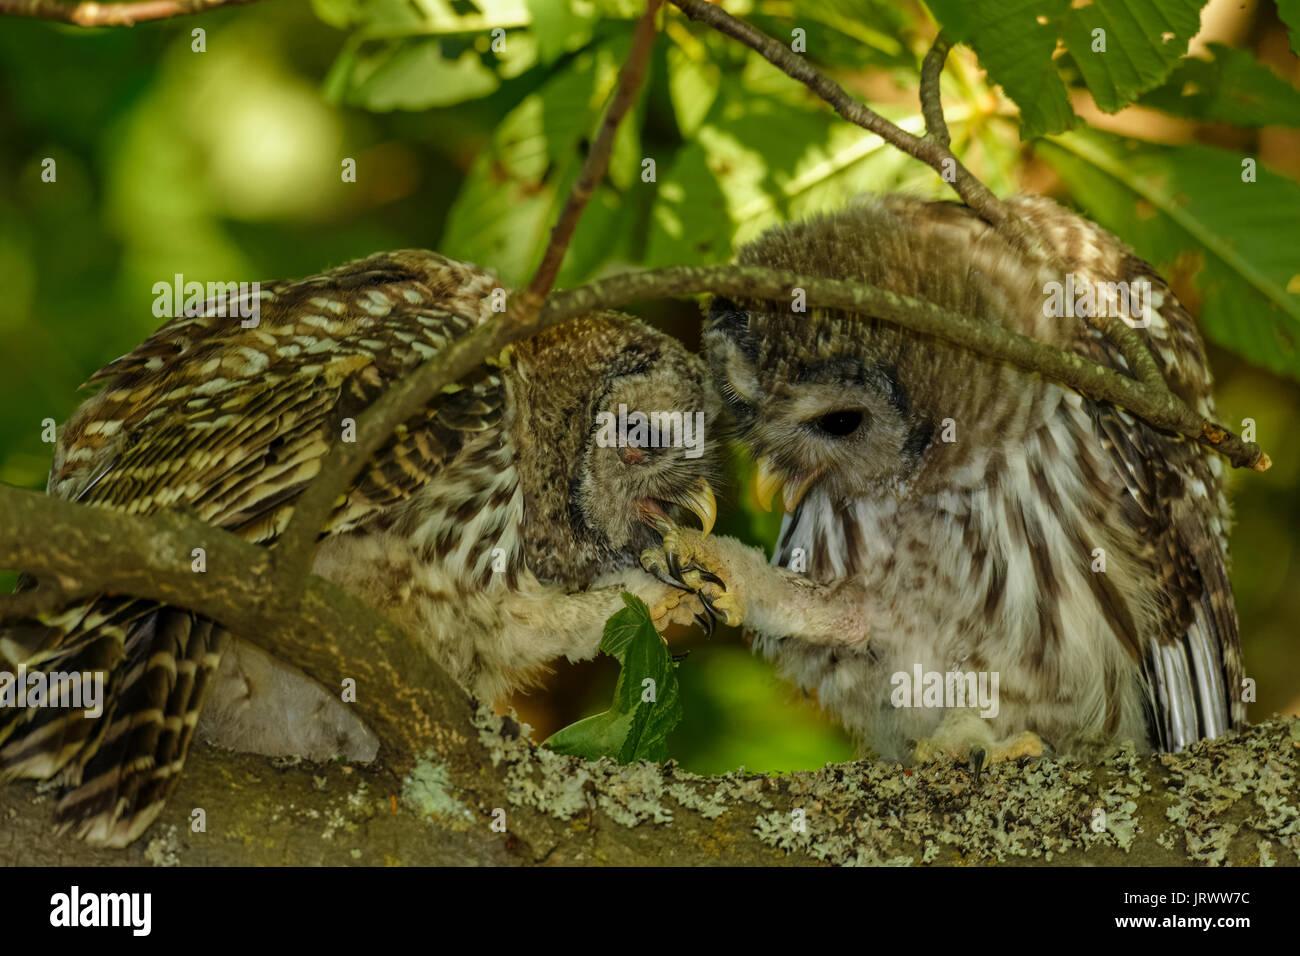 Owl Fledglings Stock Photos & Owl Fledglings Stock Images ...